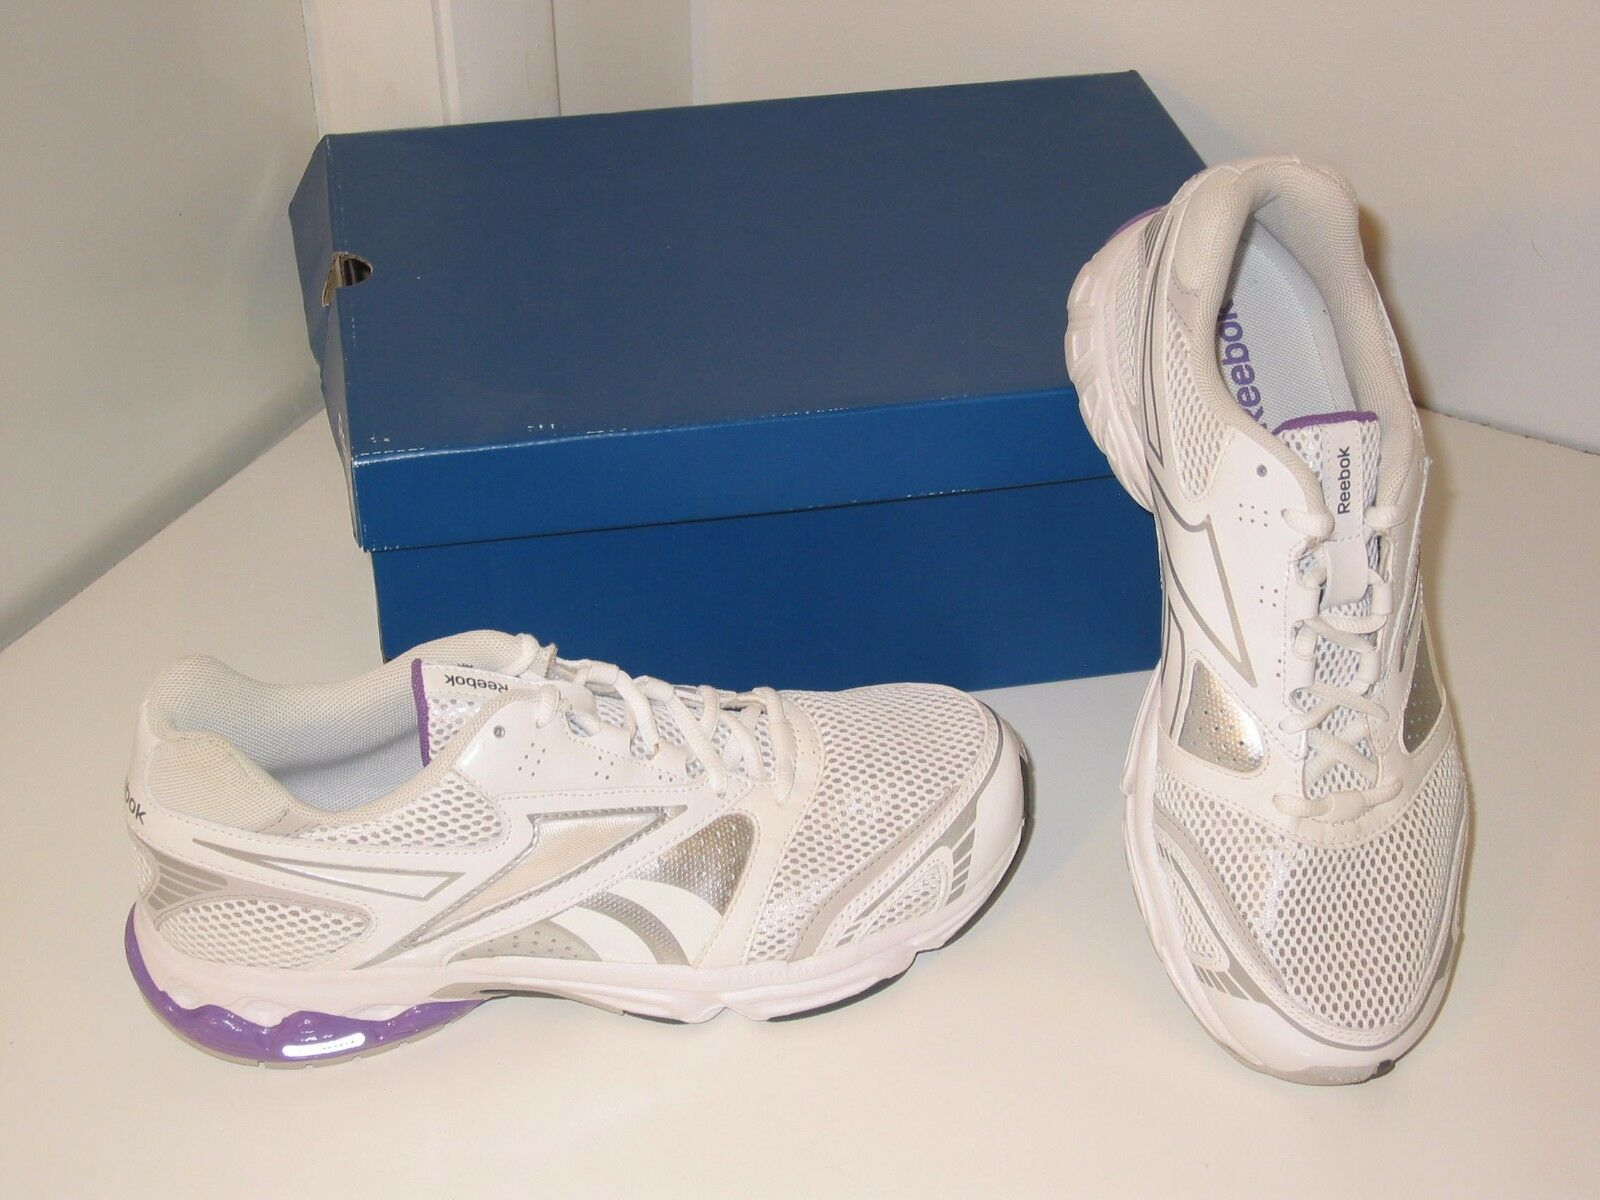 Reebok Instant II Running Cross Training White Mesh Sneakers Shoes Womens 11